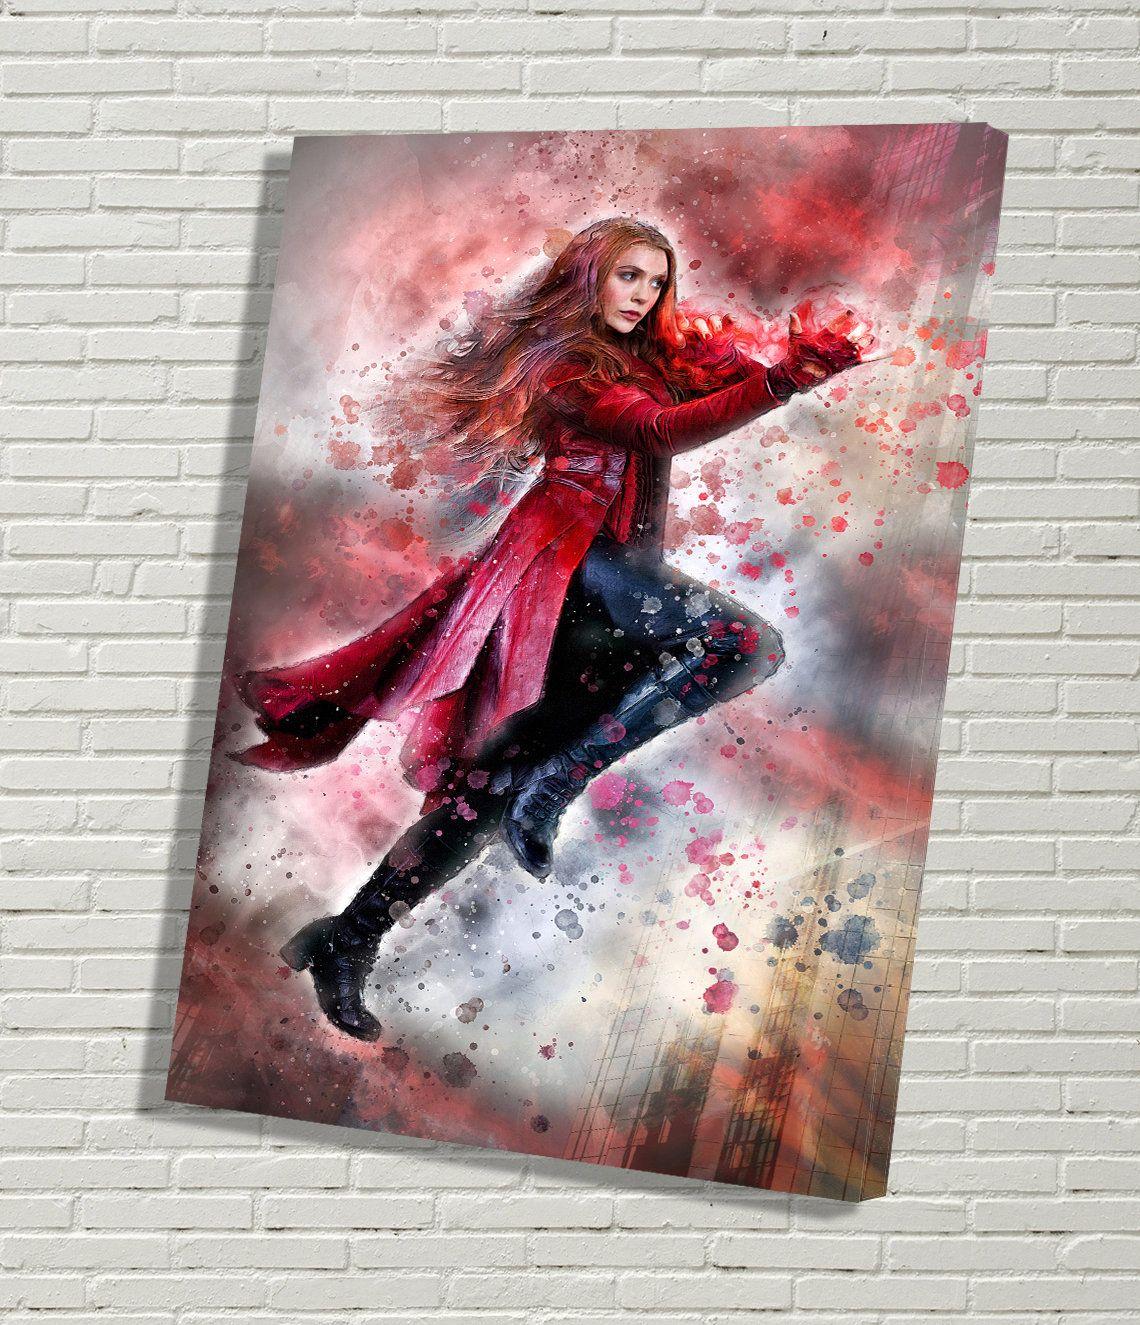 Poster Avengers Endgame Painting Art Print Scarlet Witch Watercolor Canvas Print Elizabeth Olsen Wanda Maximoff